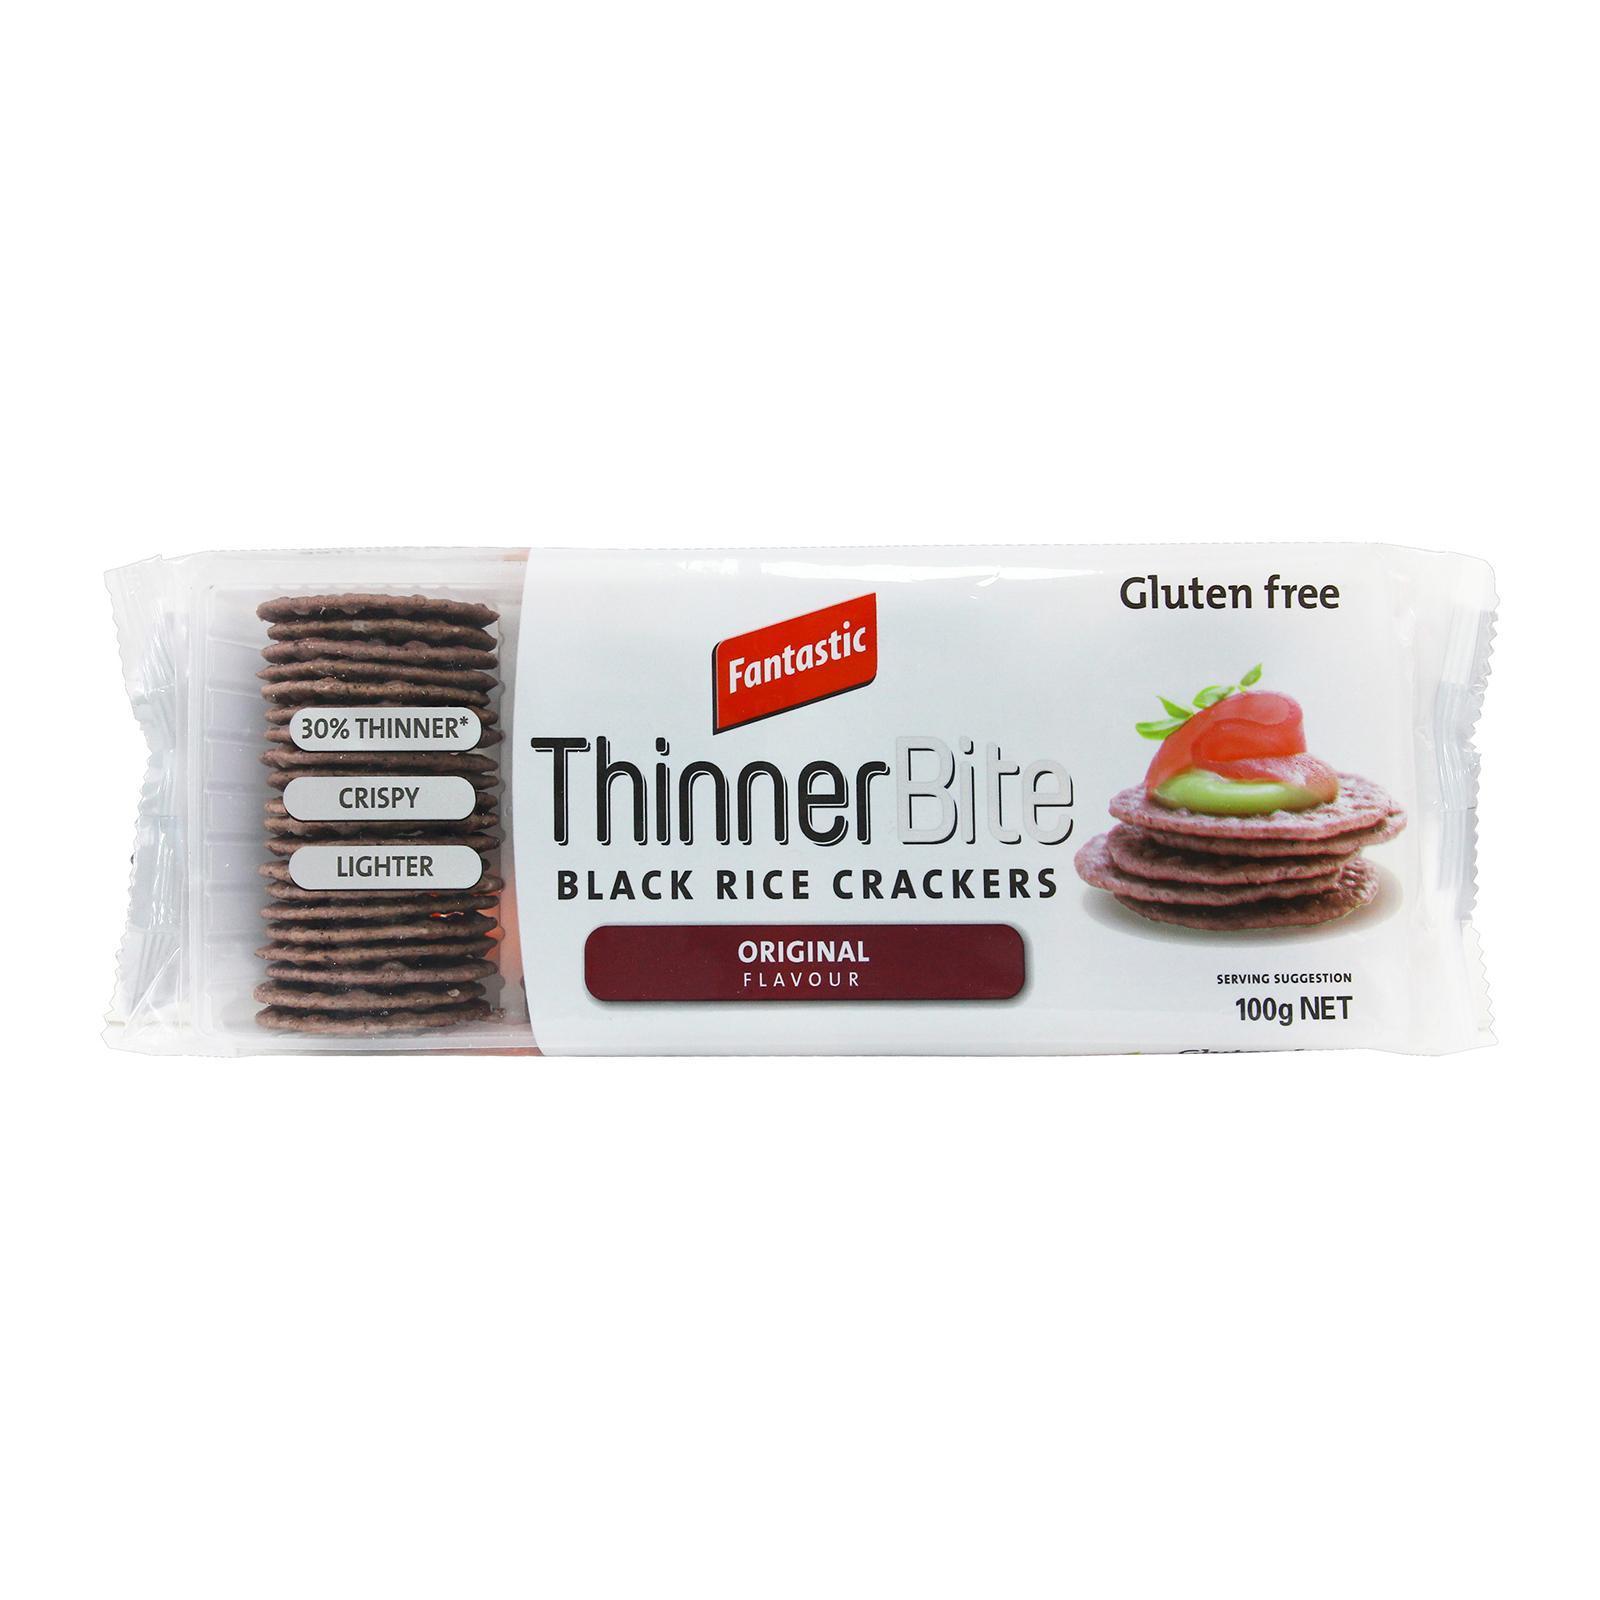 Fantastic Thinner Bite Black Rice Crackers Original Flavour Crackers